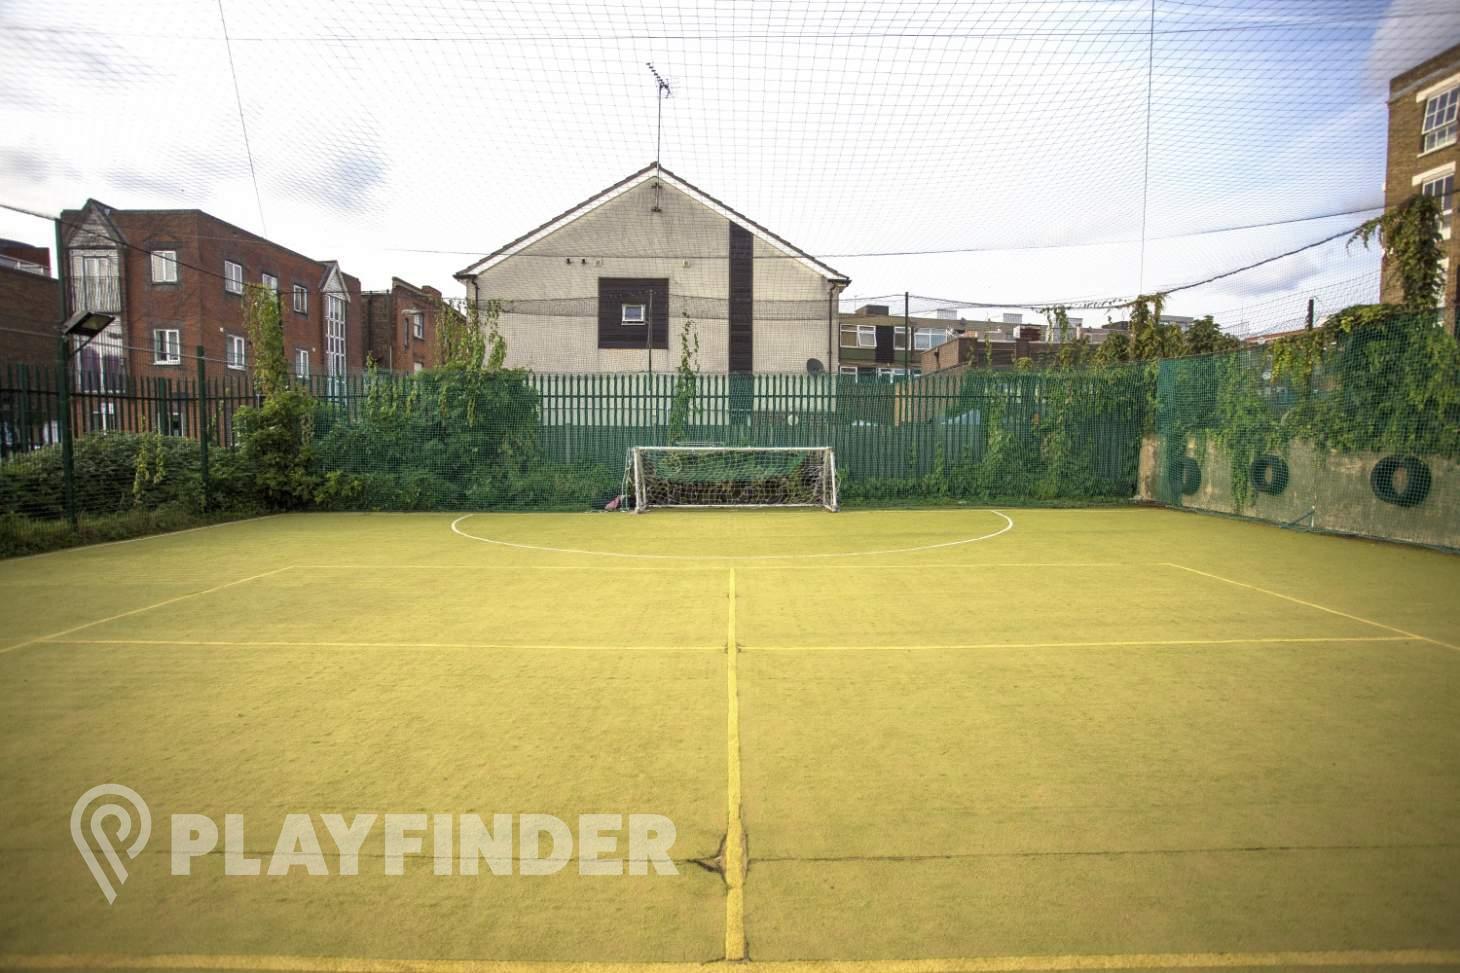 Weavers Adventure Playground Outdoor | Astroturf hockey pitch